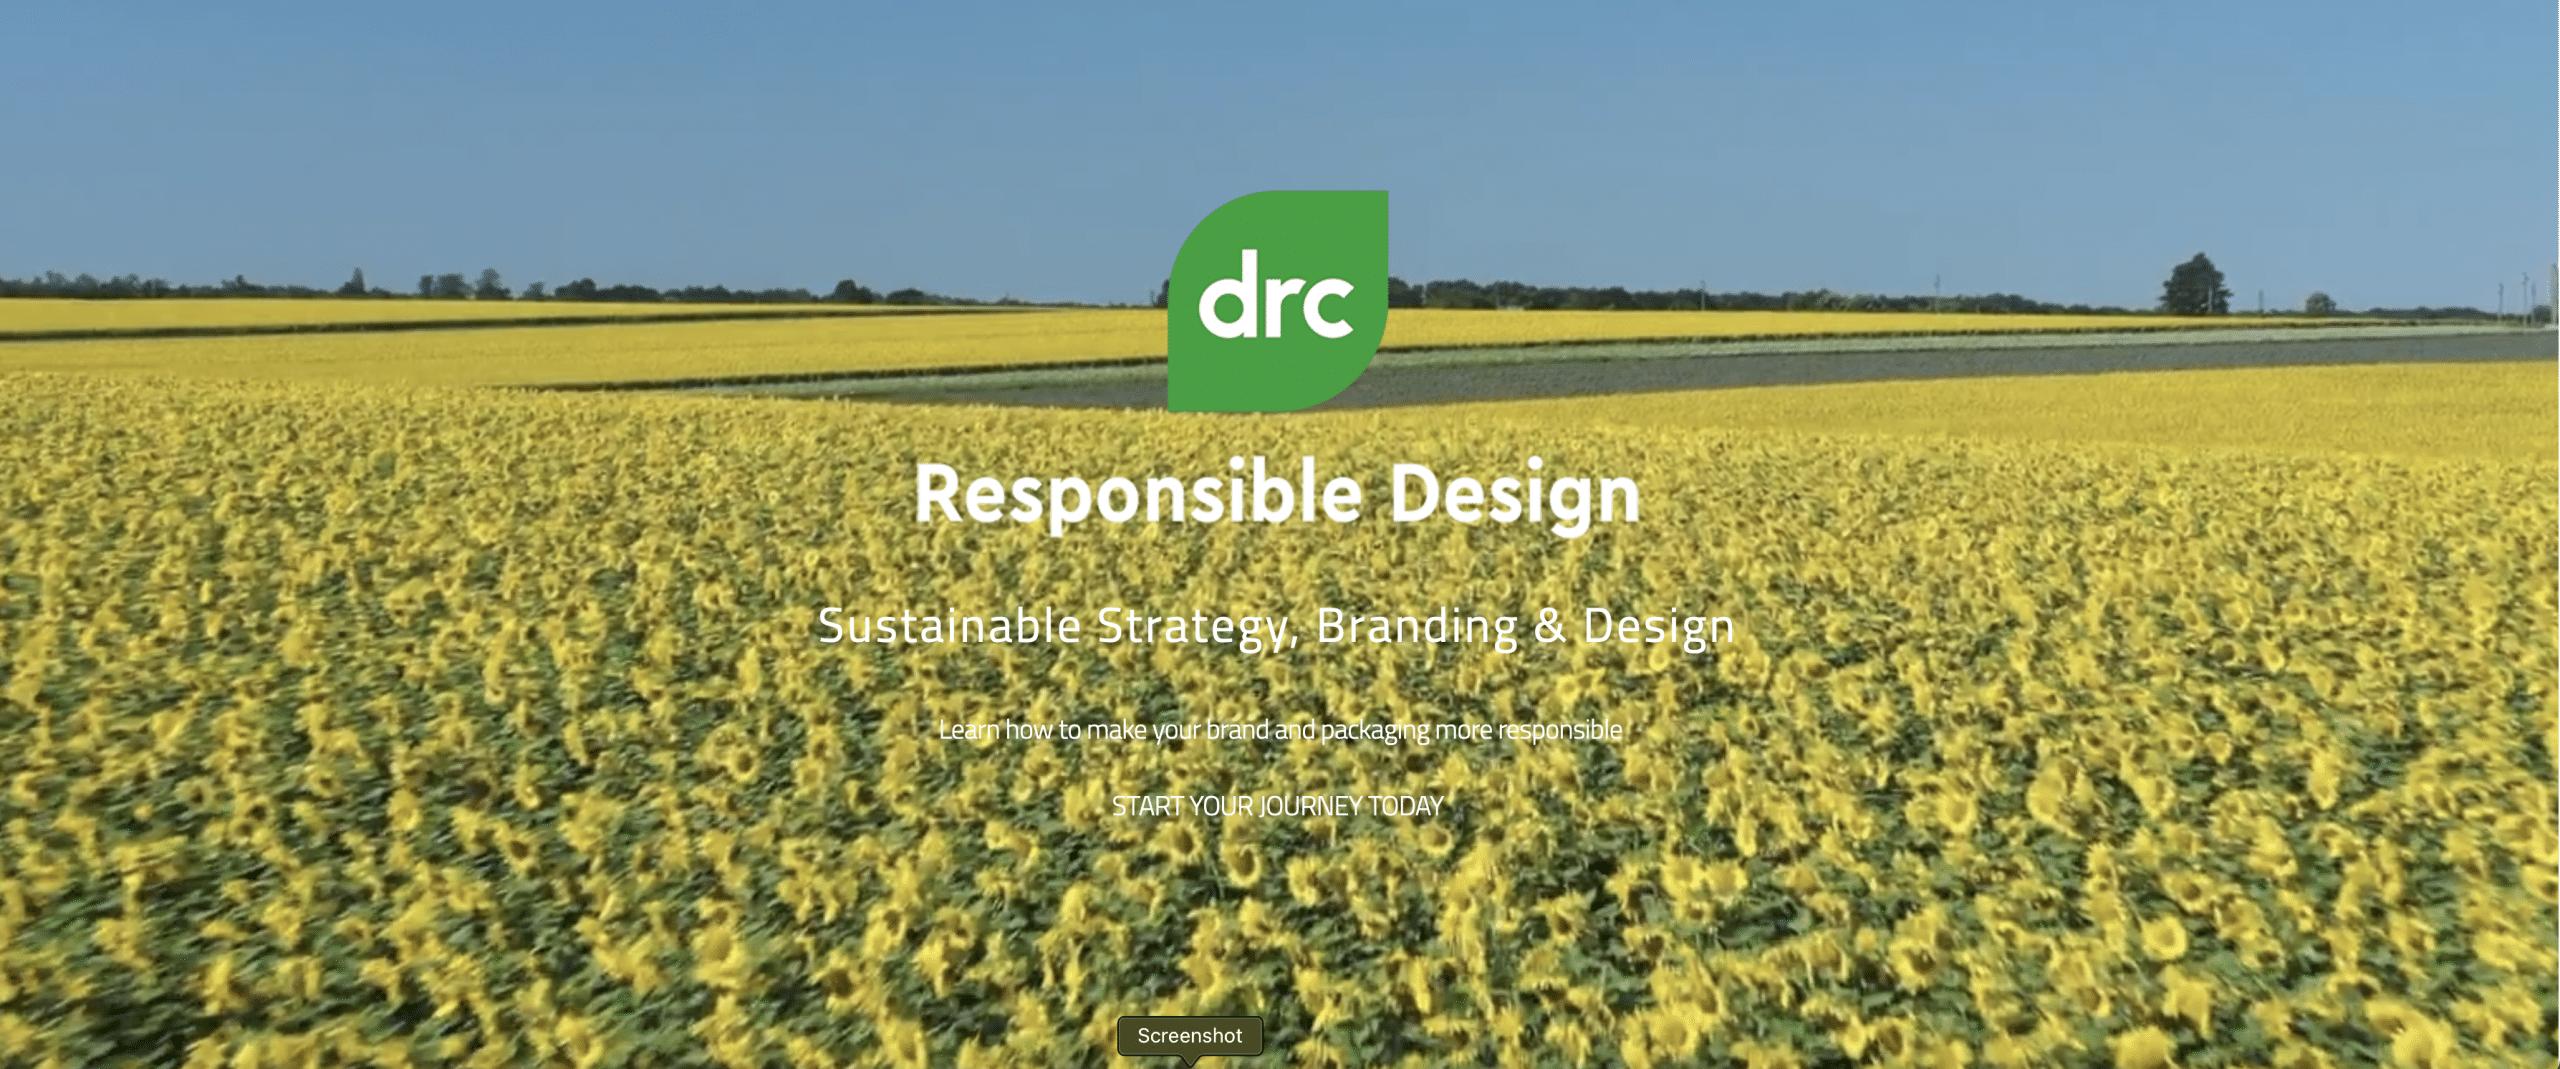 Chicago's Design Resource Center Launches Sustainable Design Initiative